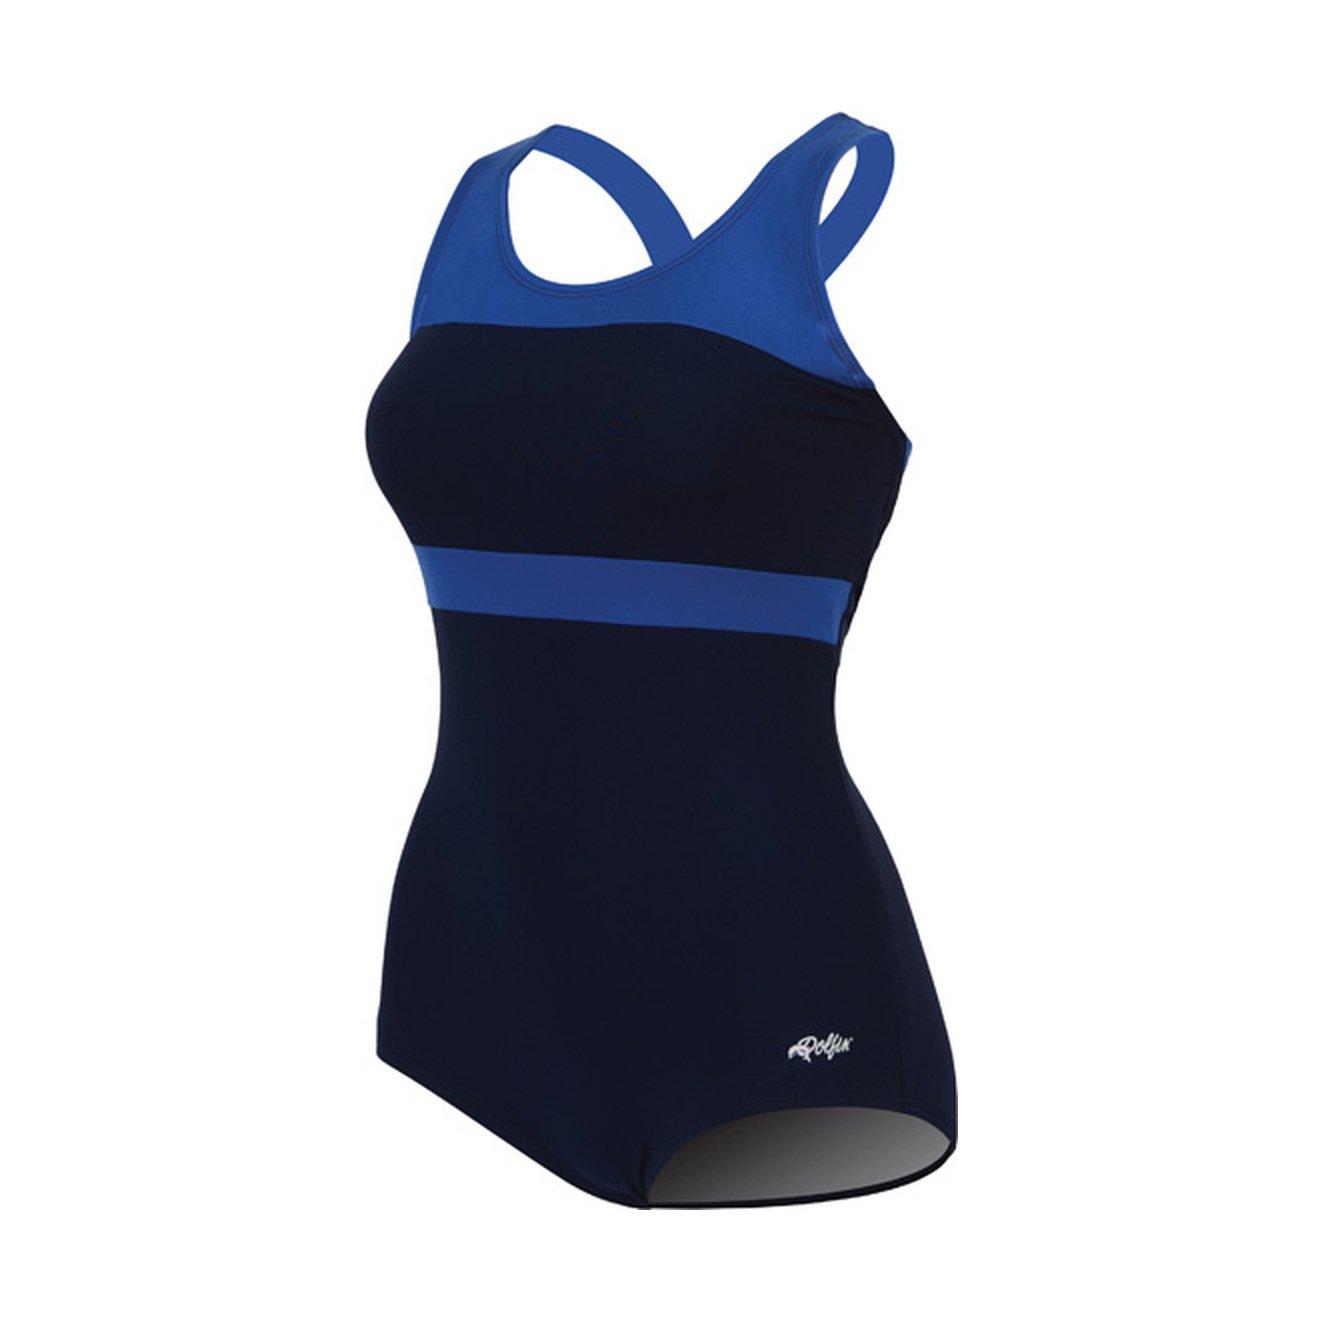 Dolfin Color-Block Conservative Lap Suit Womens Navy/Royal Size 22 by Dolfin